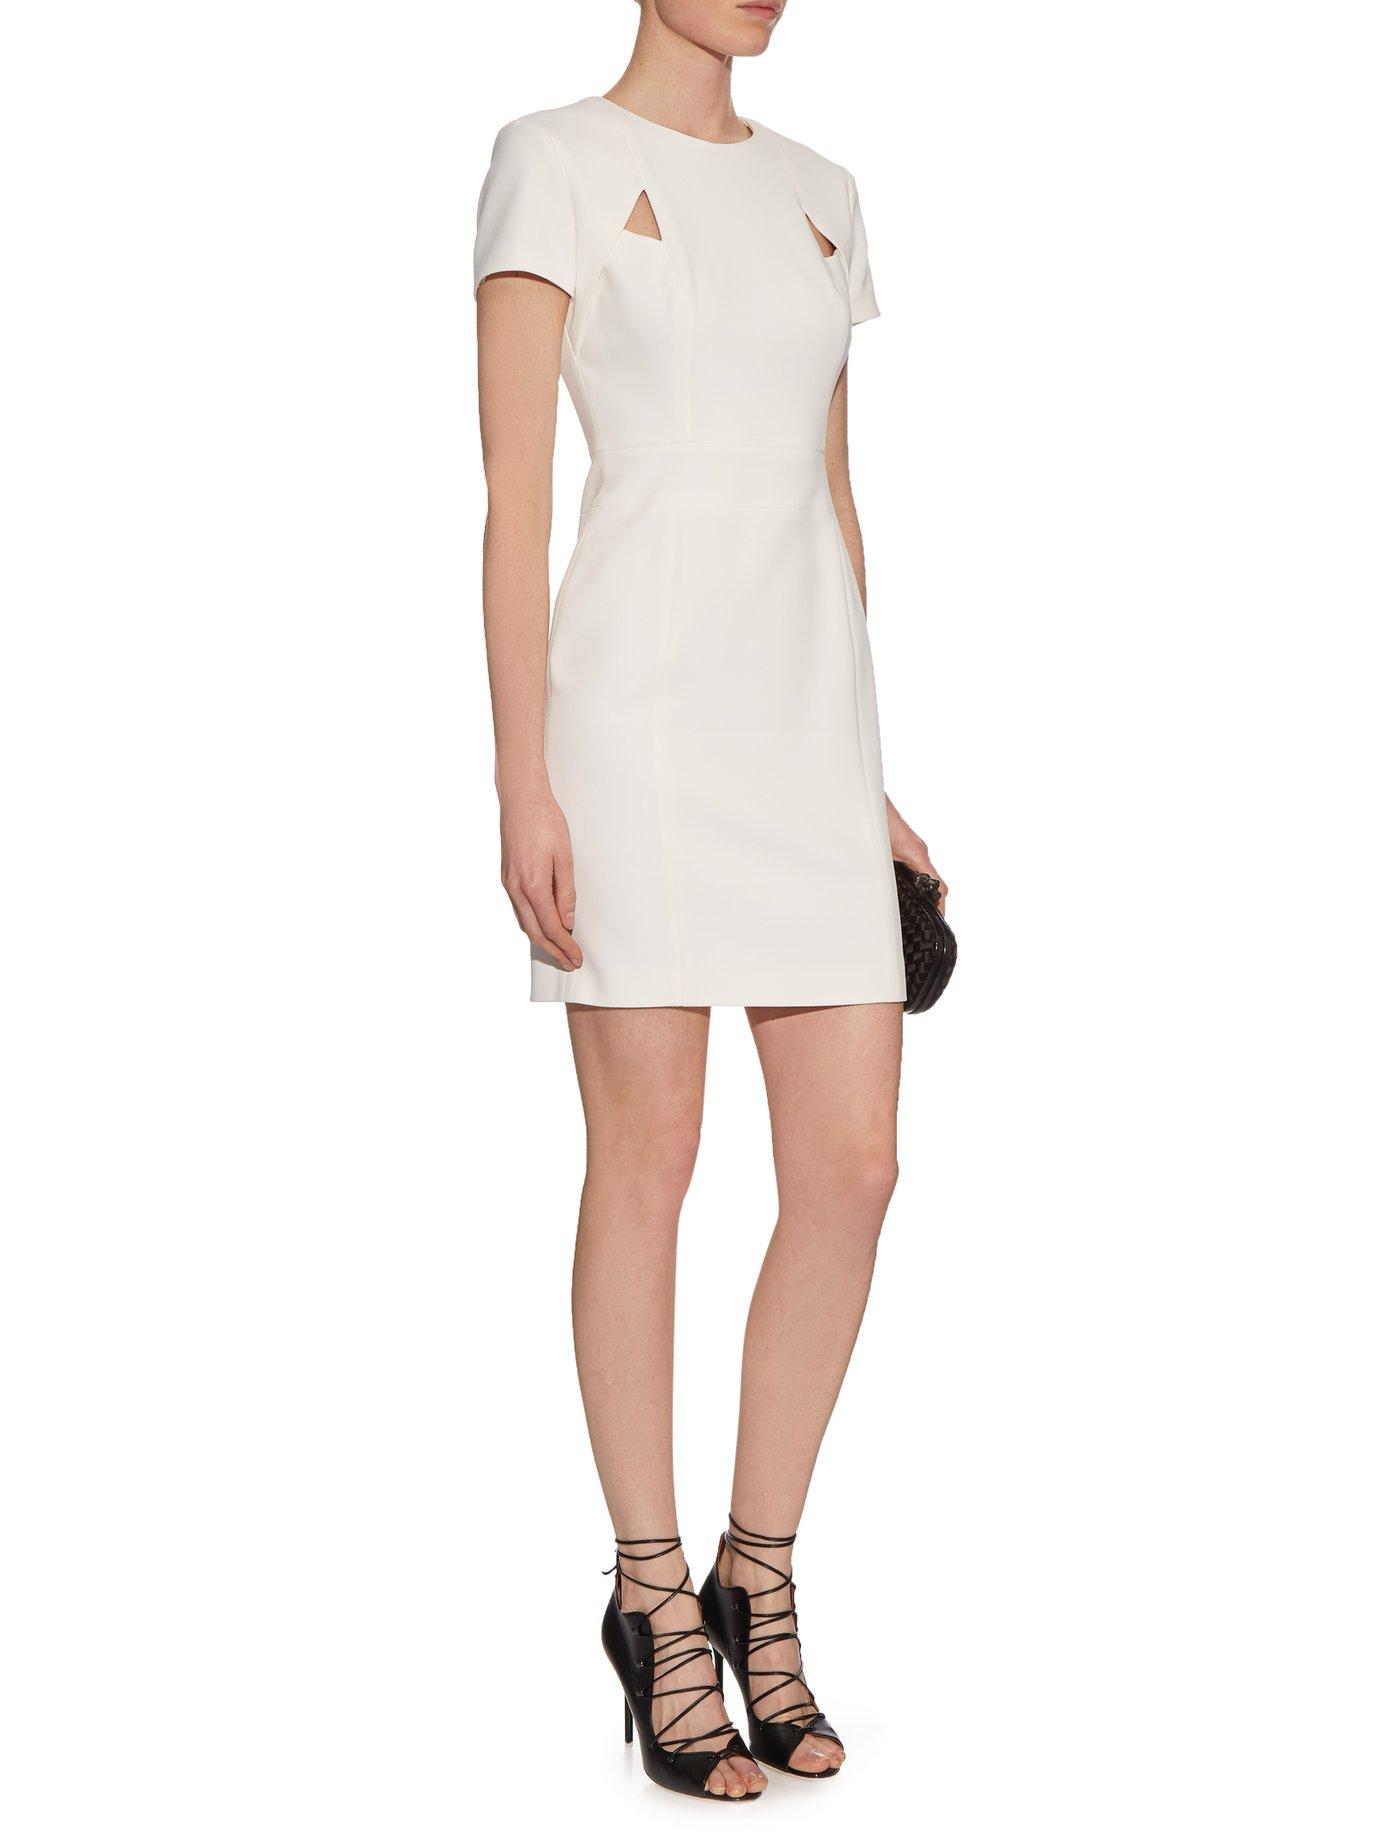 Senso cut-out crepe dress by La Mania